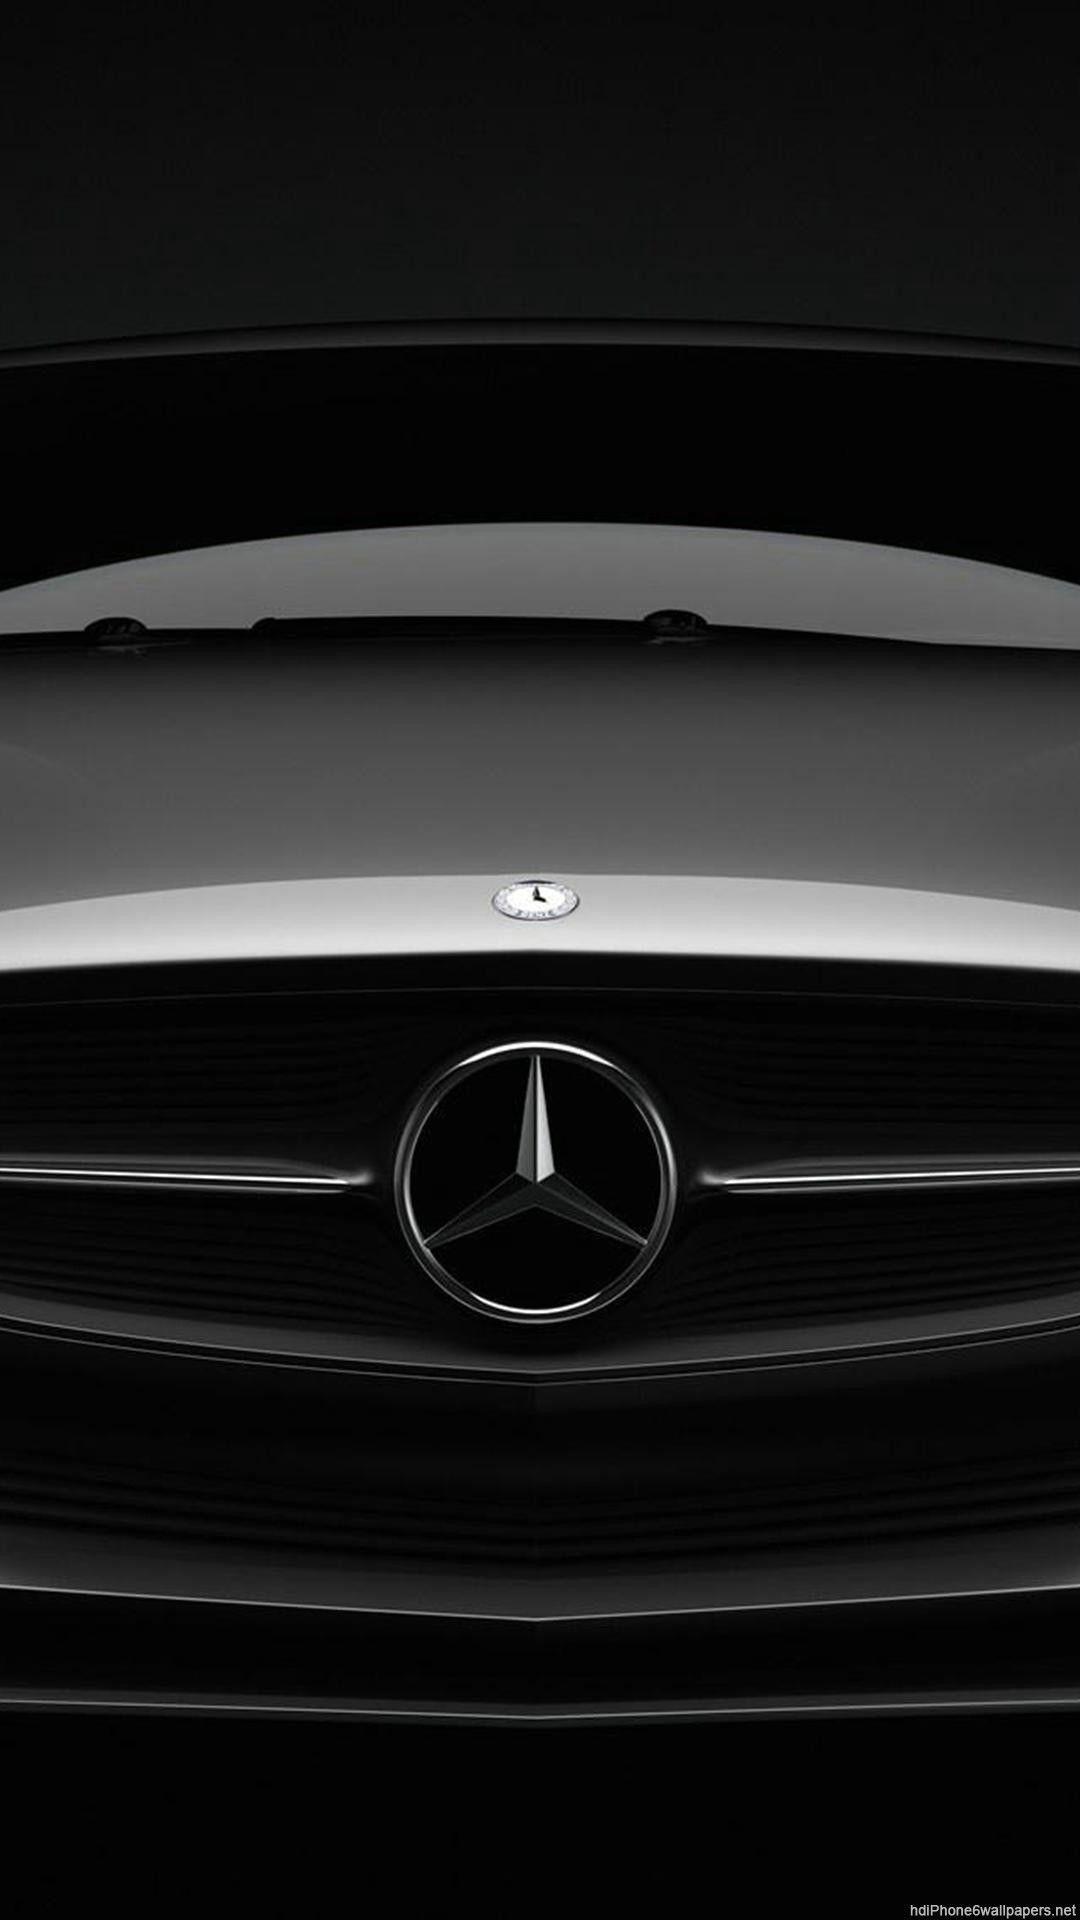 Mercedes Benz Iphone Wallpapers Top Free Mercedes Benz Iphone